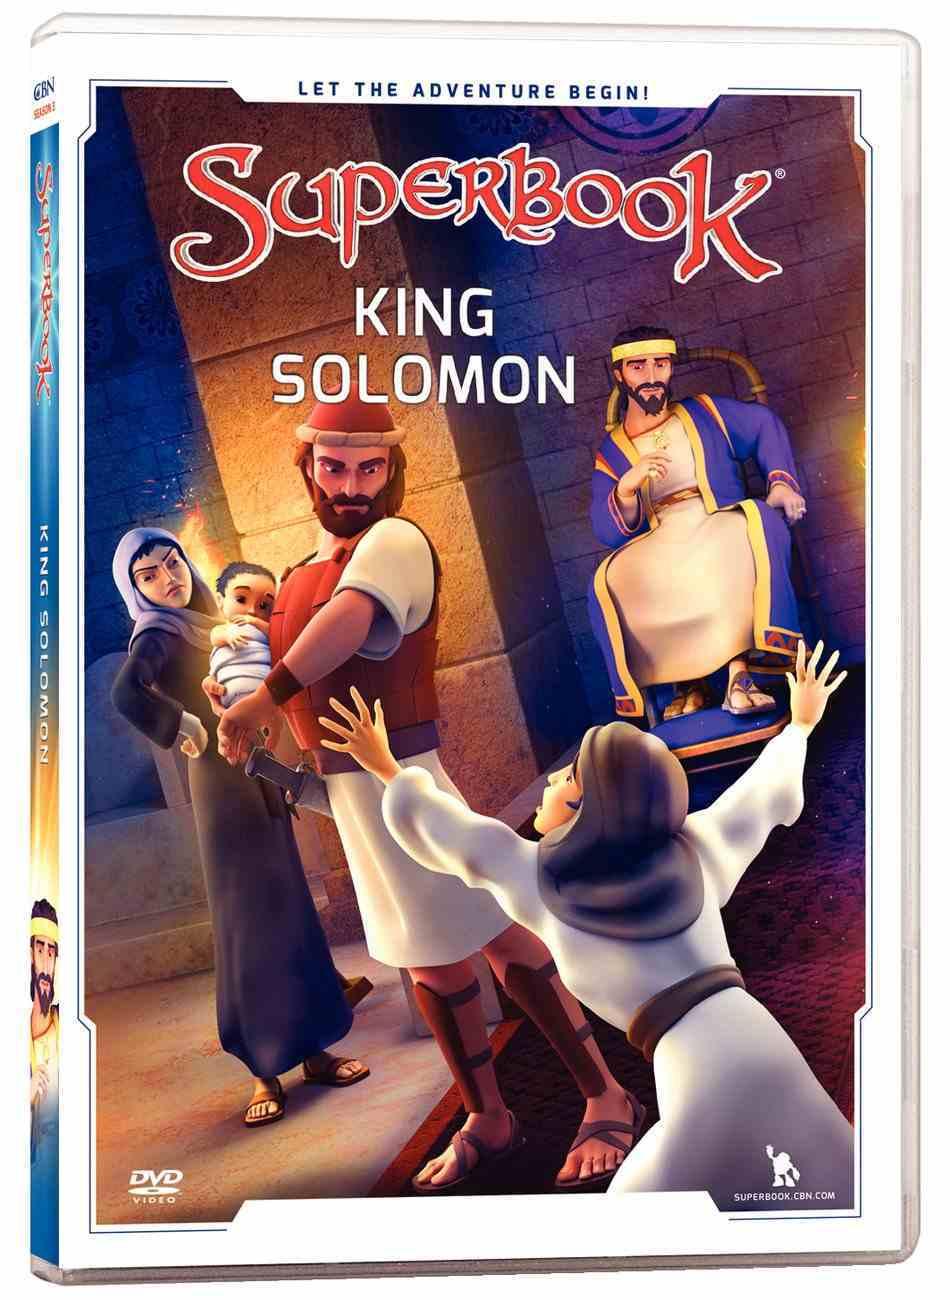 King Solomon (#11 in Superbook Dvd Series Season 3) DVD